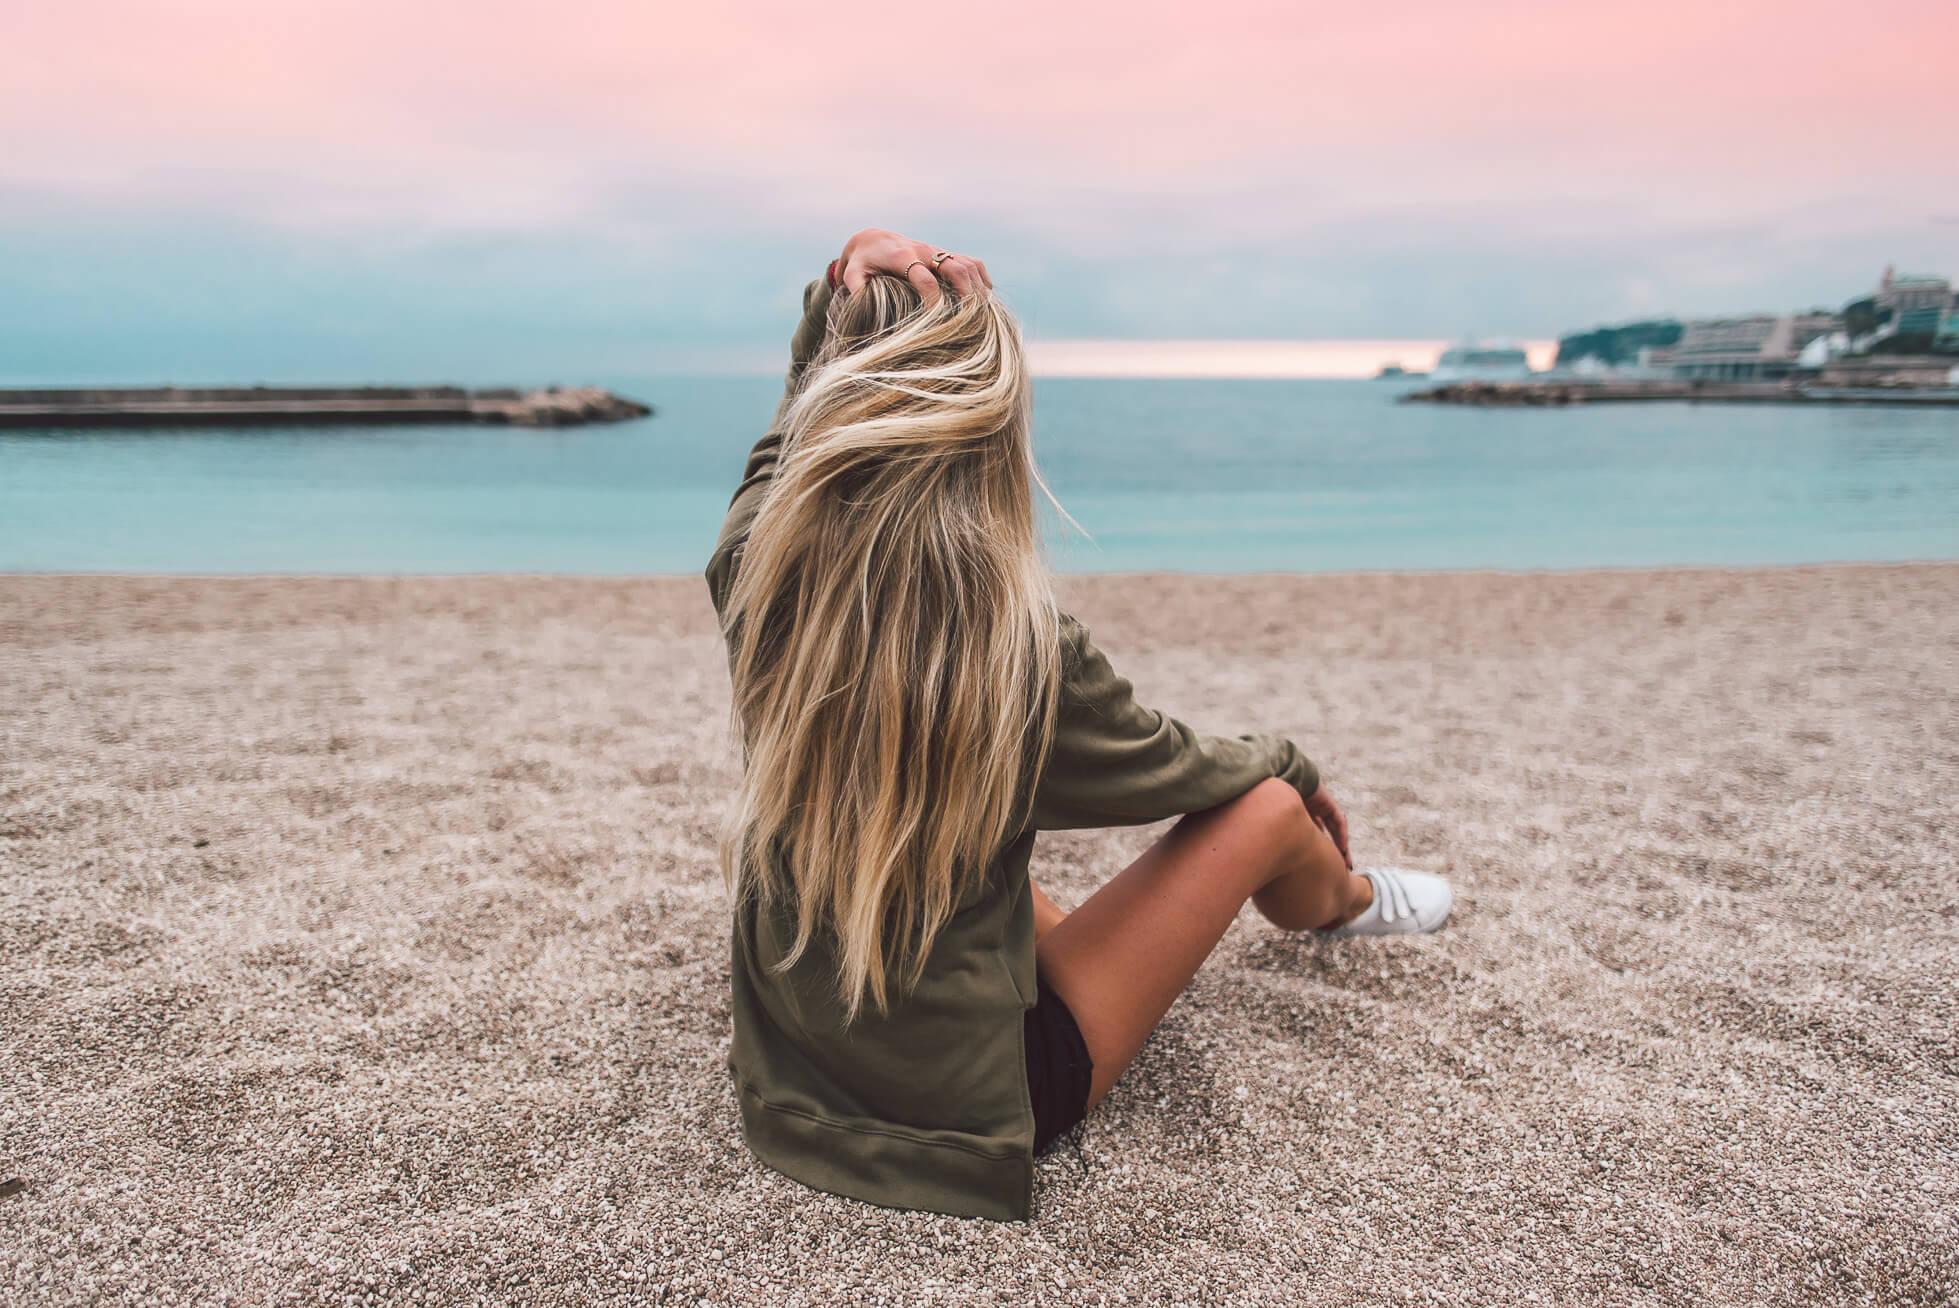 janni-deler-beachy-moment-sunsetDSC_6972